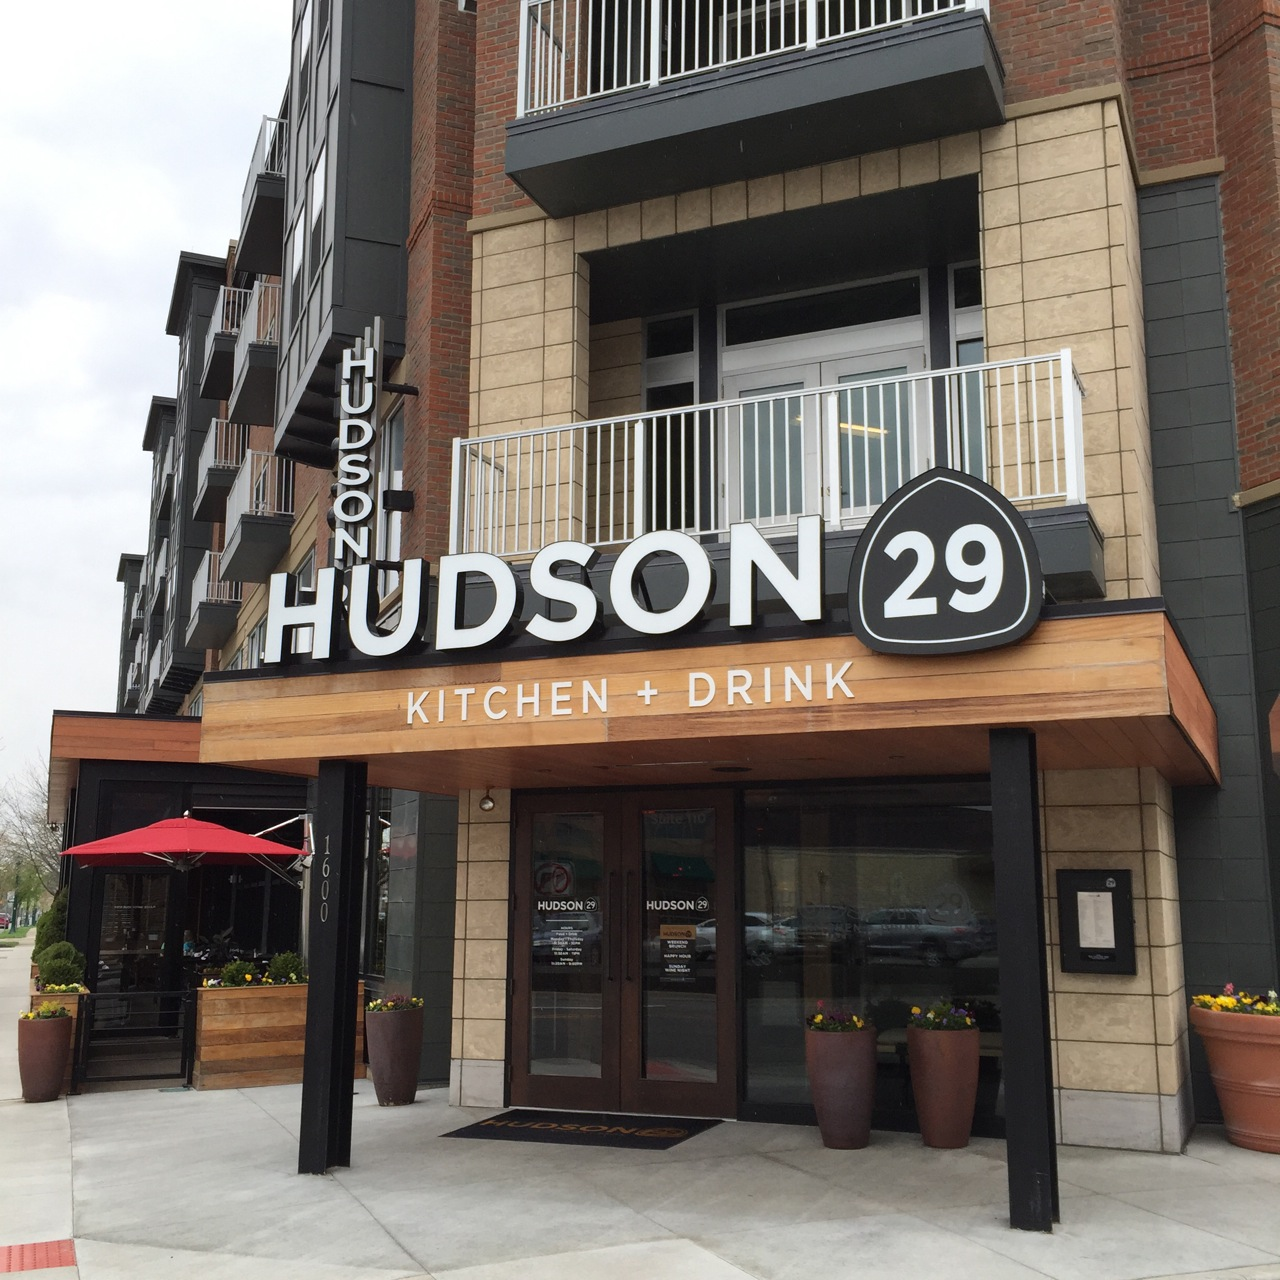 hudson 29 kitchen drink upper arlington oh breakfast with nick rh breakfastwithnick com hudson 29 new albany happy hour hudson 29 new albany menu